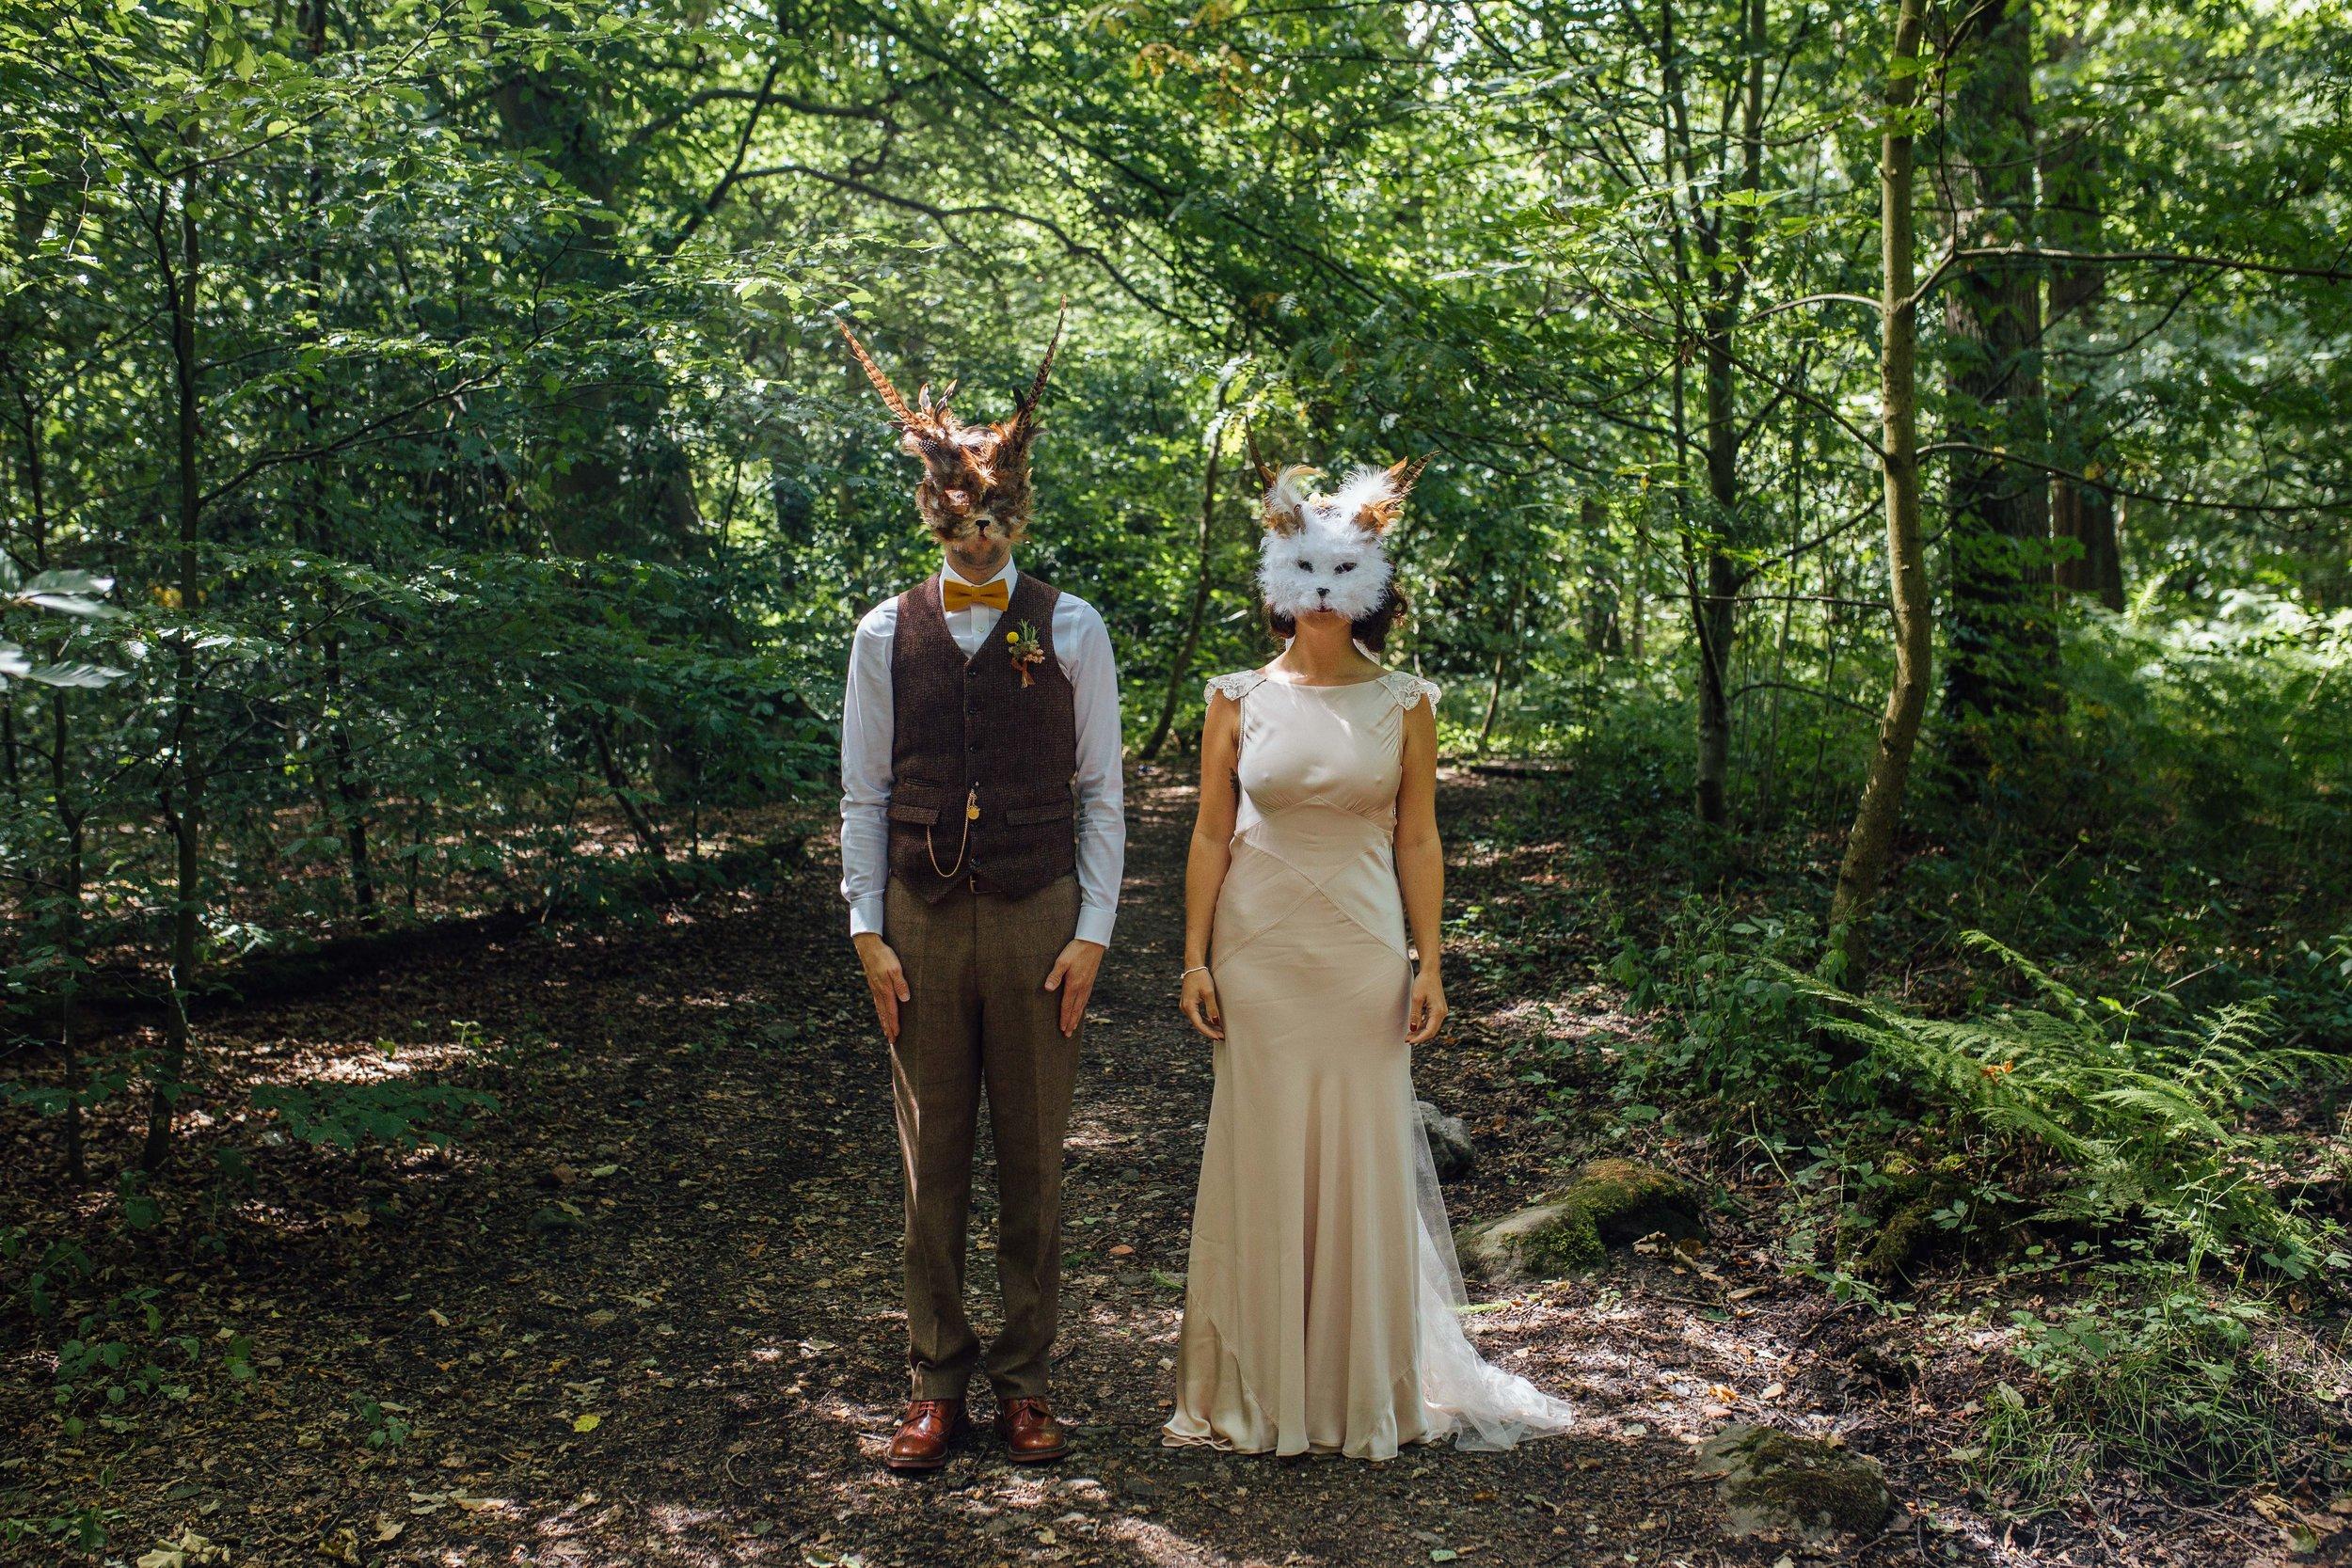 Katy-Bespoke-Veil-Sheffield-Wedding-Wes-Anderson-Susanna-Greening-Derbyshire-11